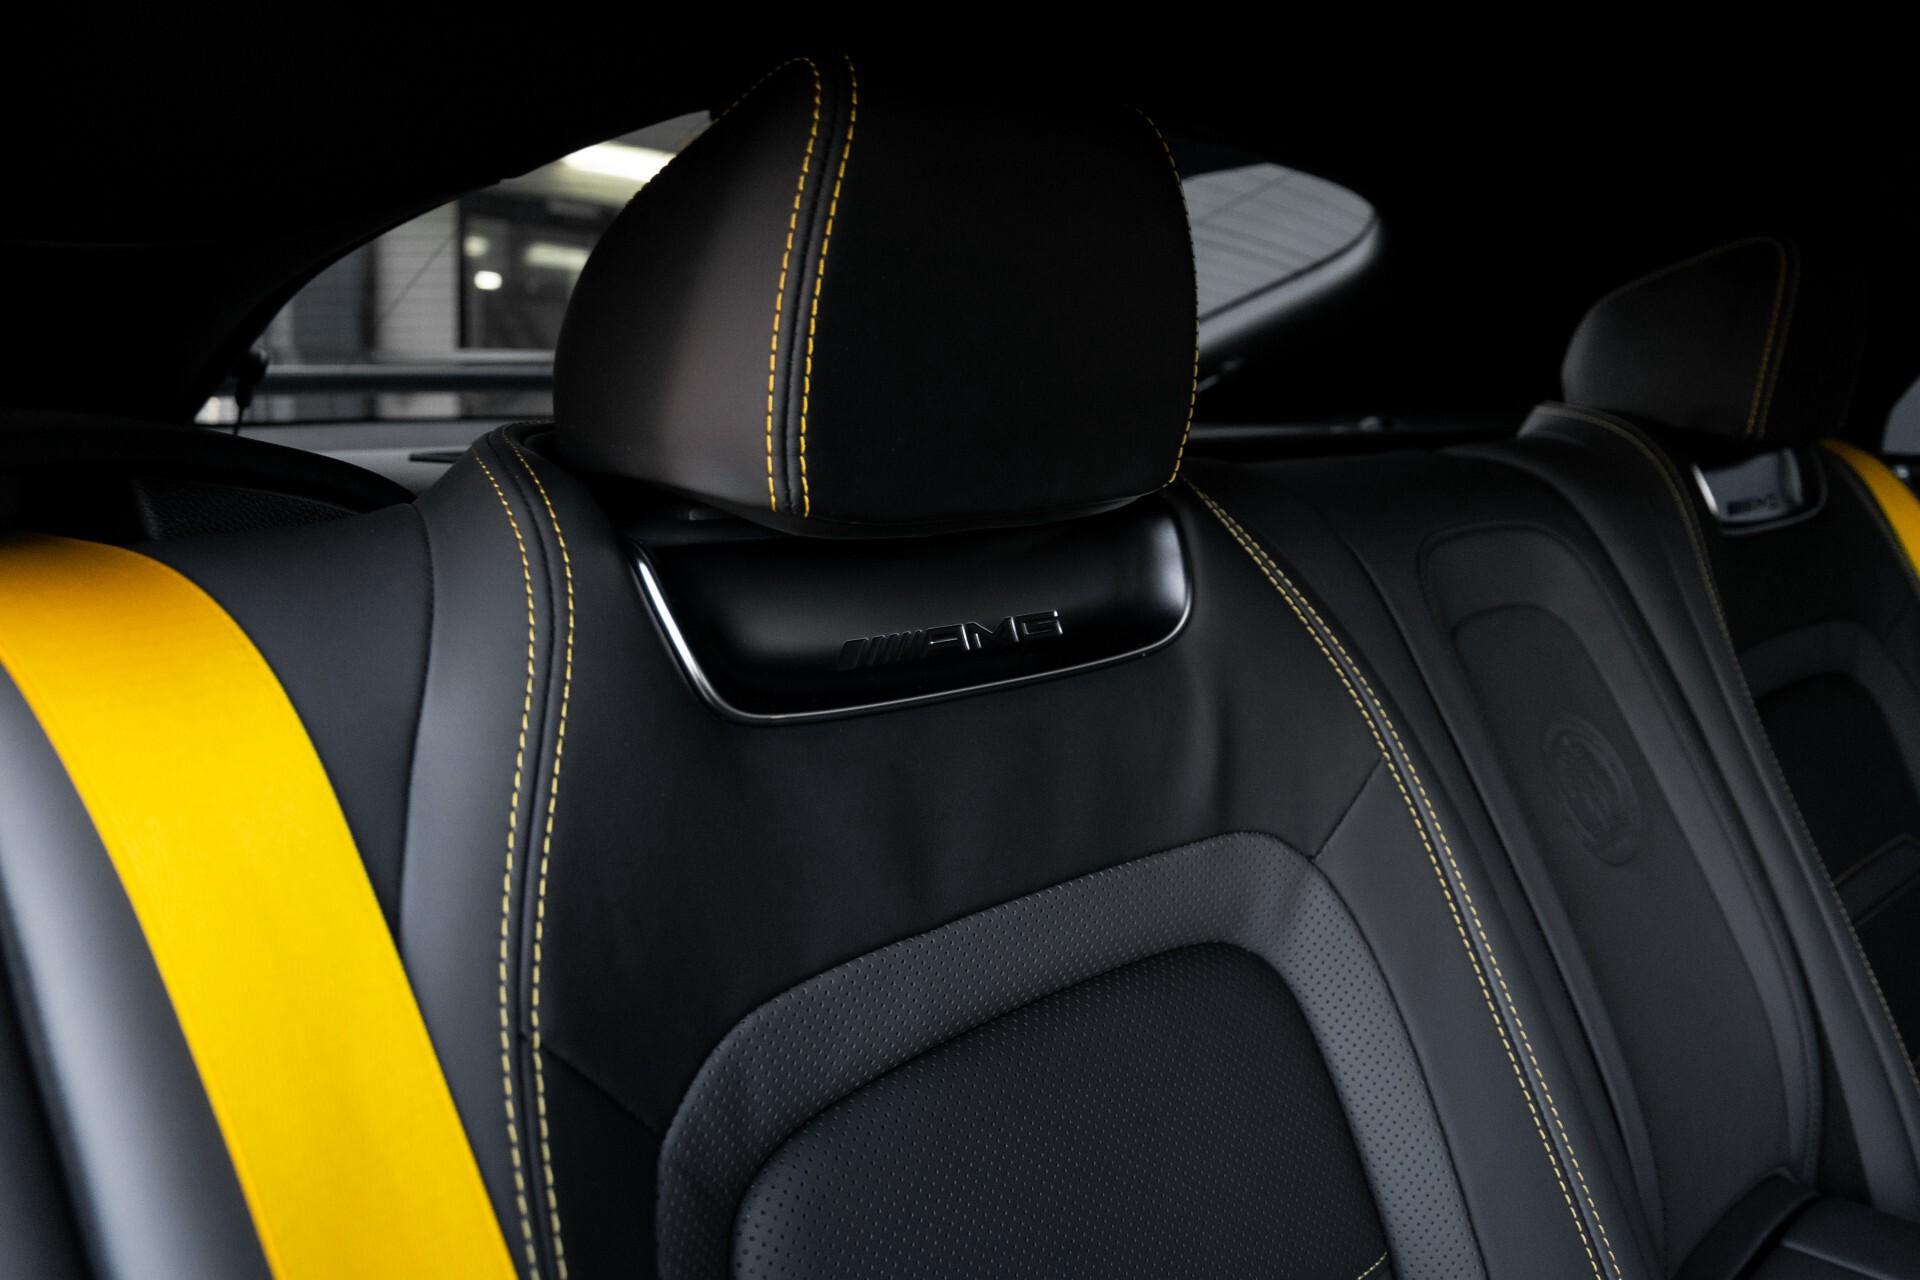 Mercedes-Benz AMG GT 4-Door Coupe 63 S 4MATIC+ Edition 1 Keramisch/Carbon/First Class/Dynamic Plus/Burmester High End 3D Aut9 Foto 69